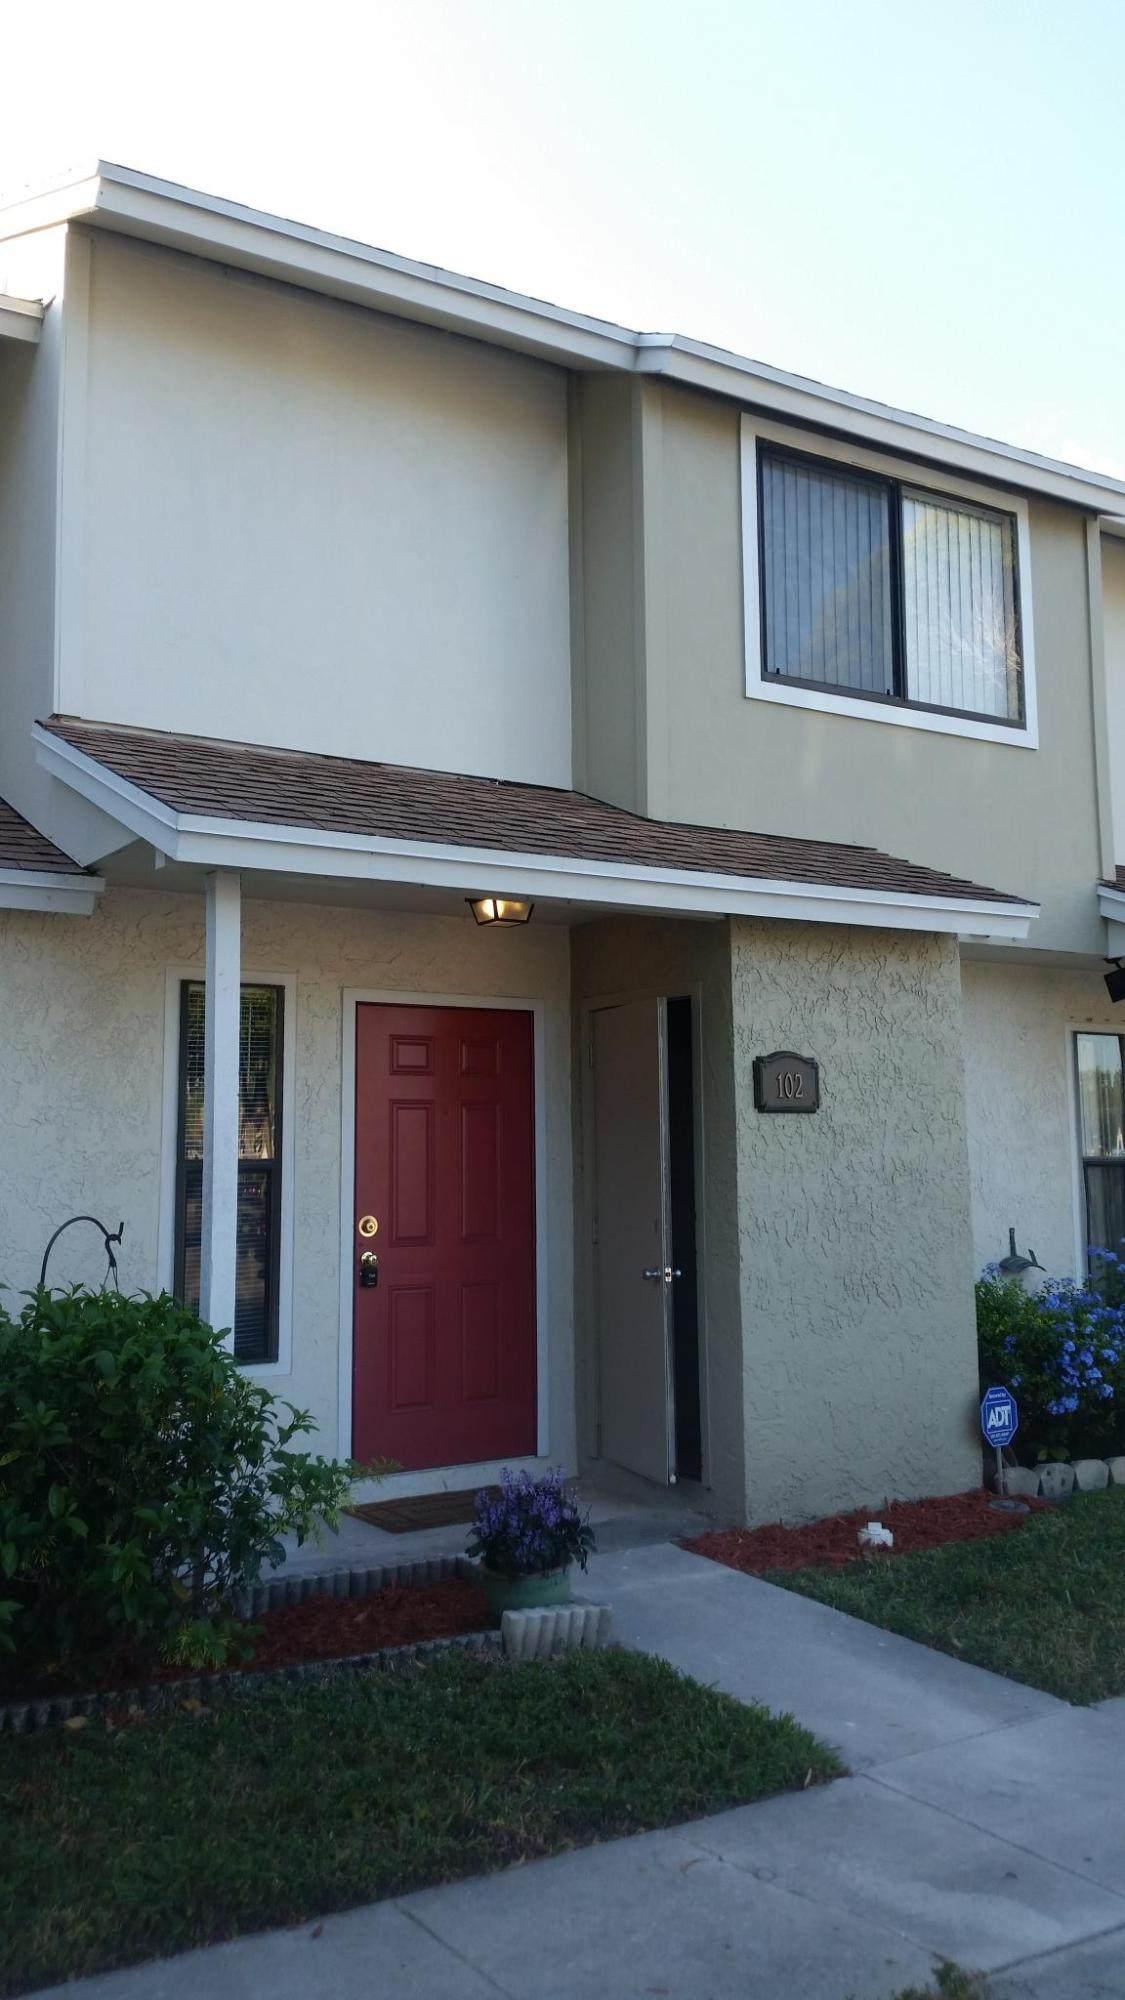 102 Shoreview Drive - Photo 1